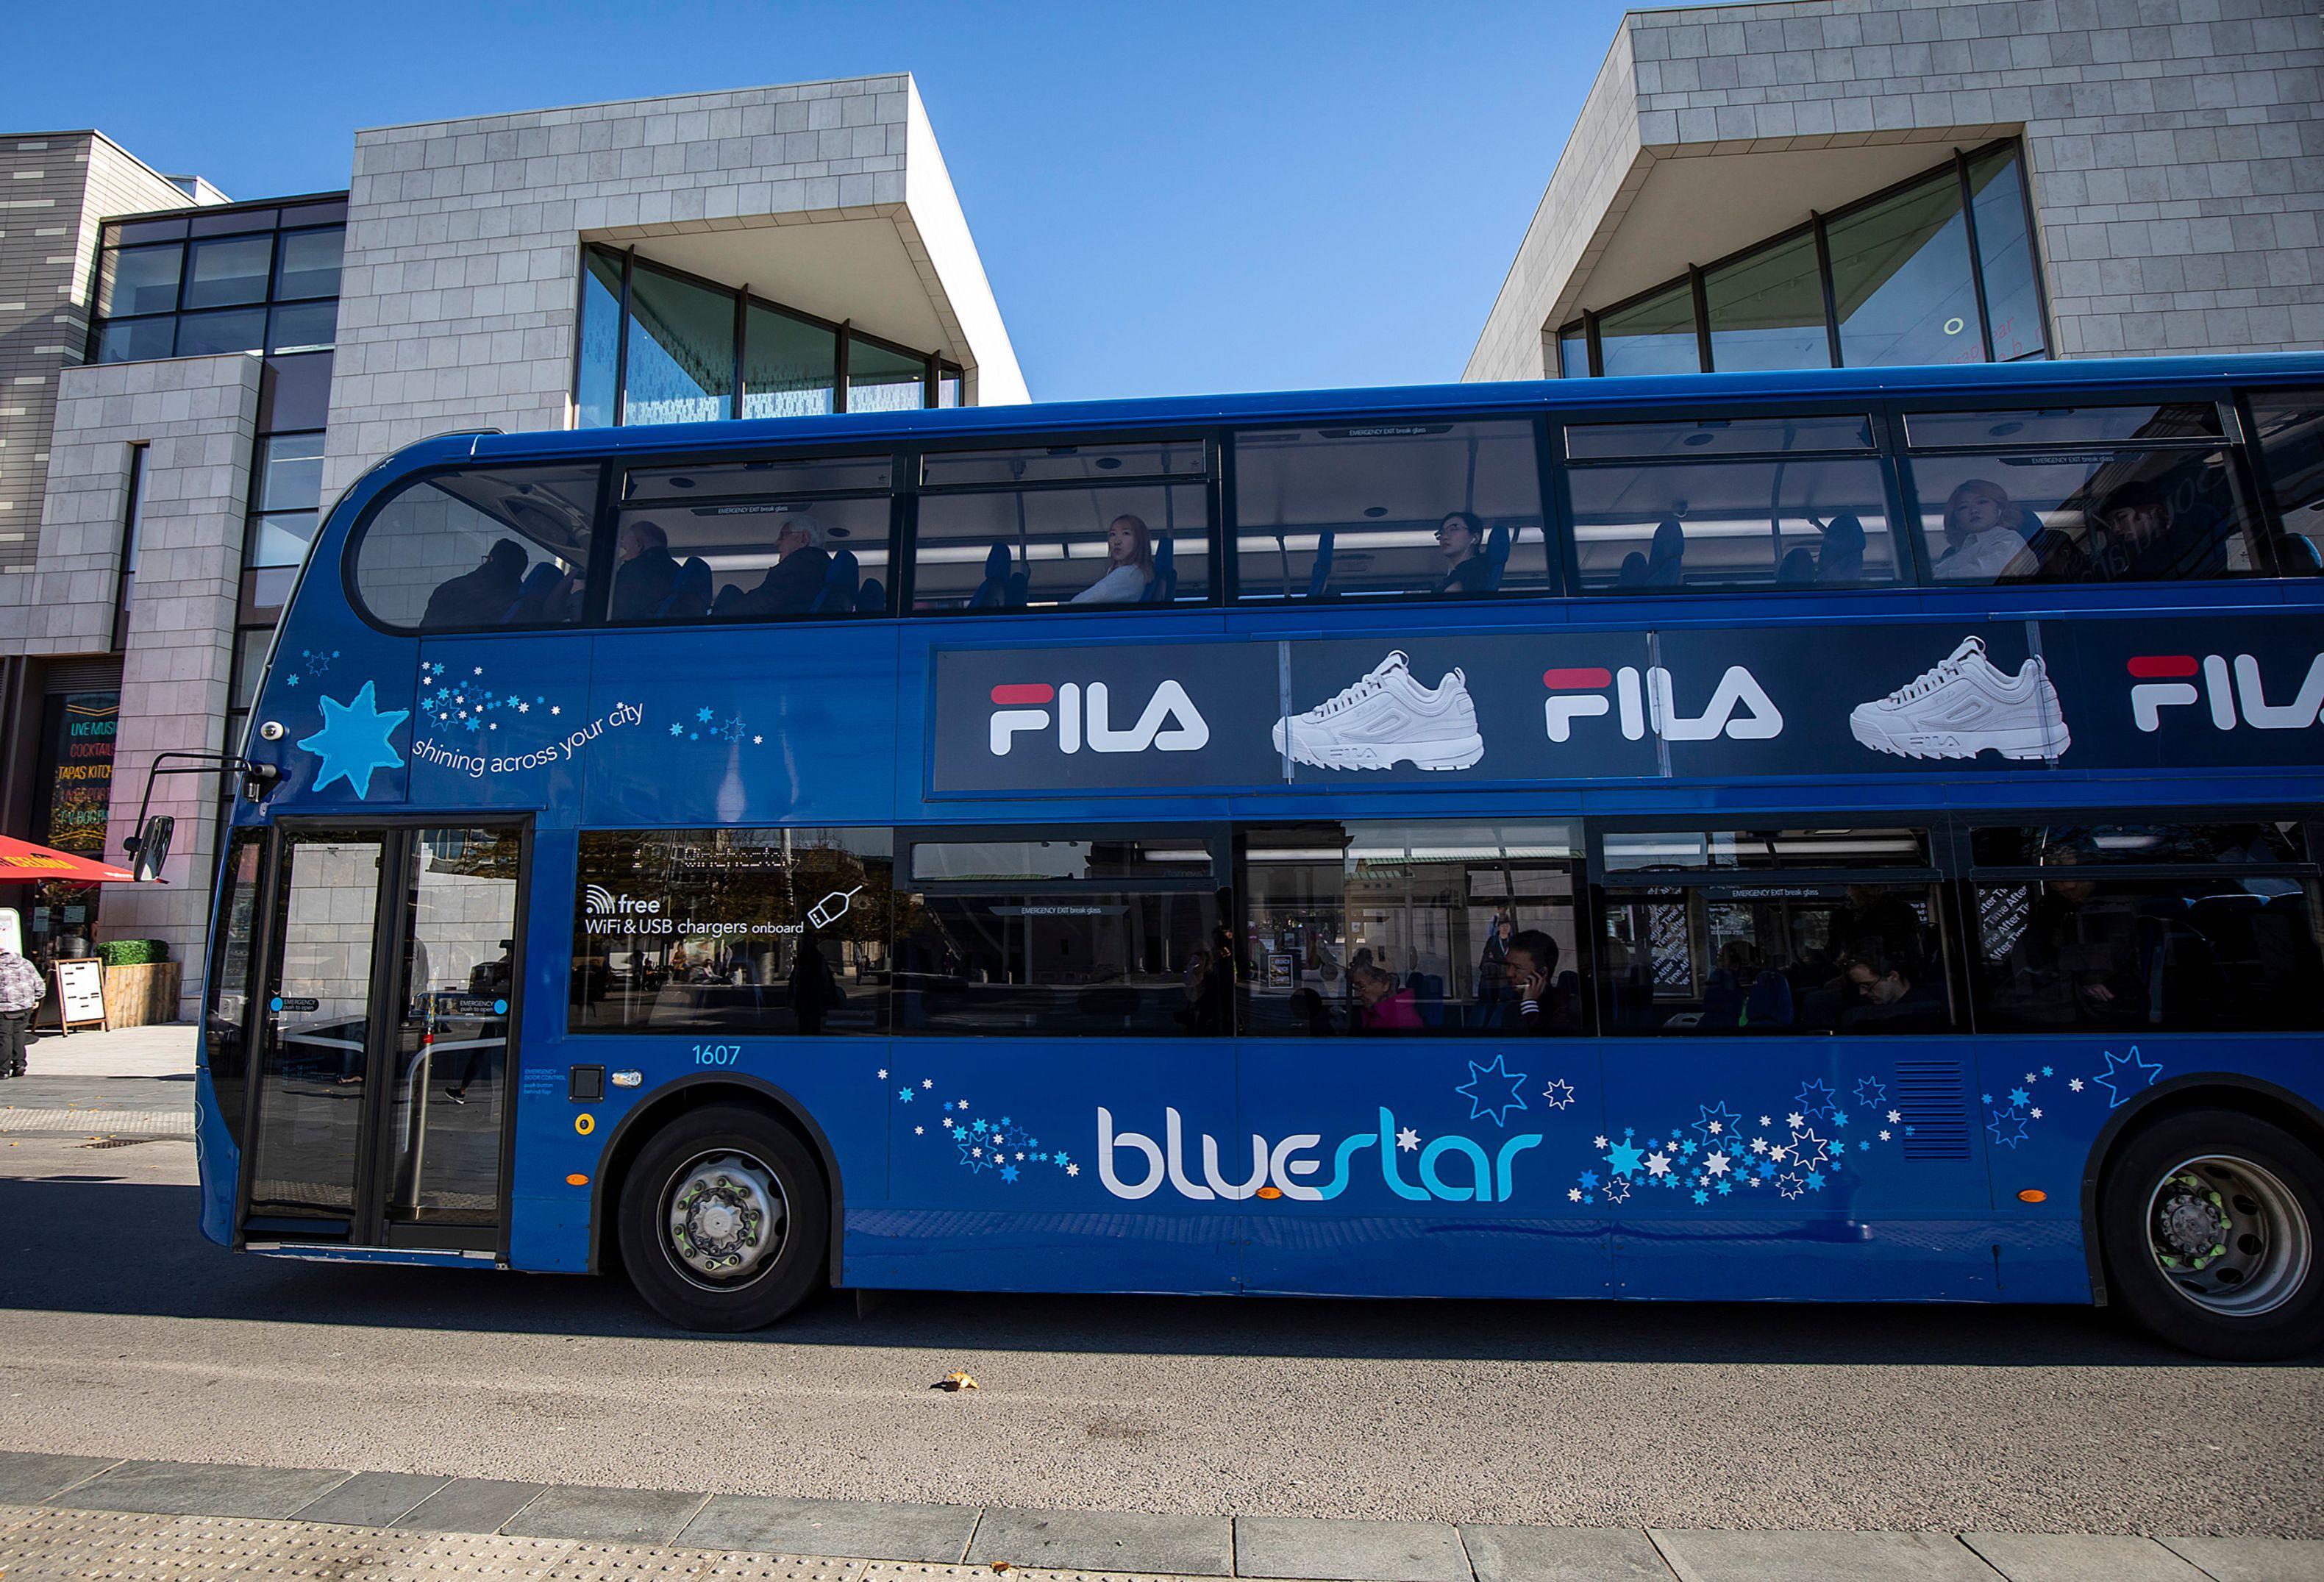 Bluestar bus in Southampton